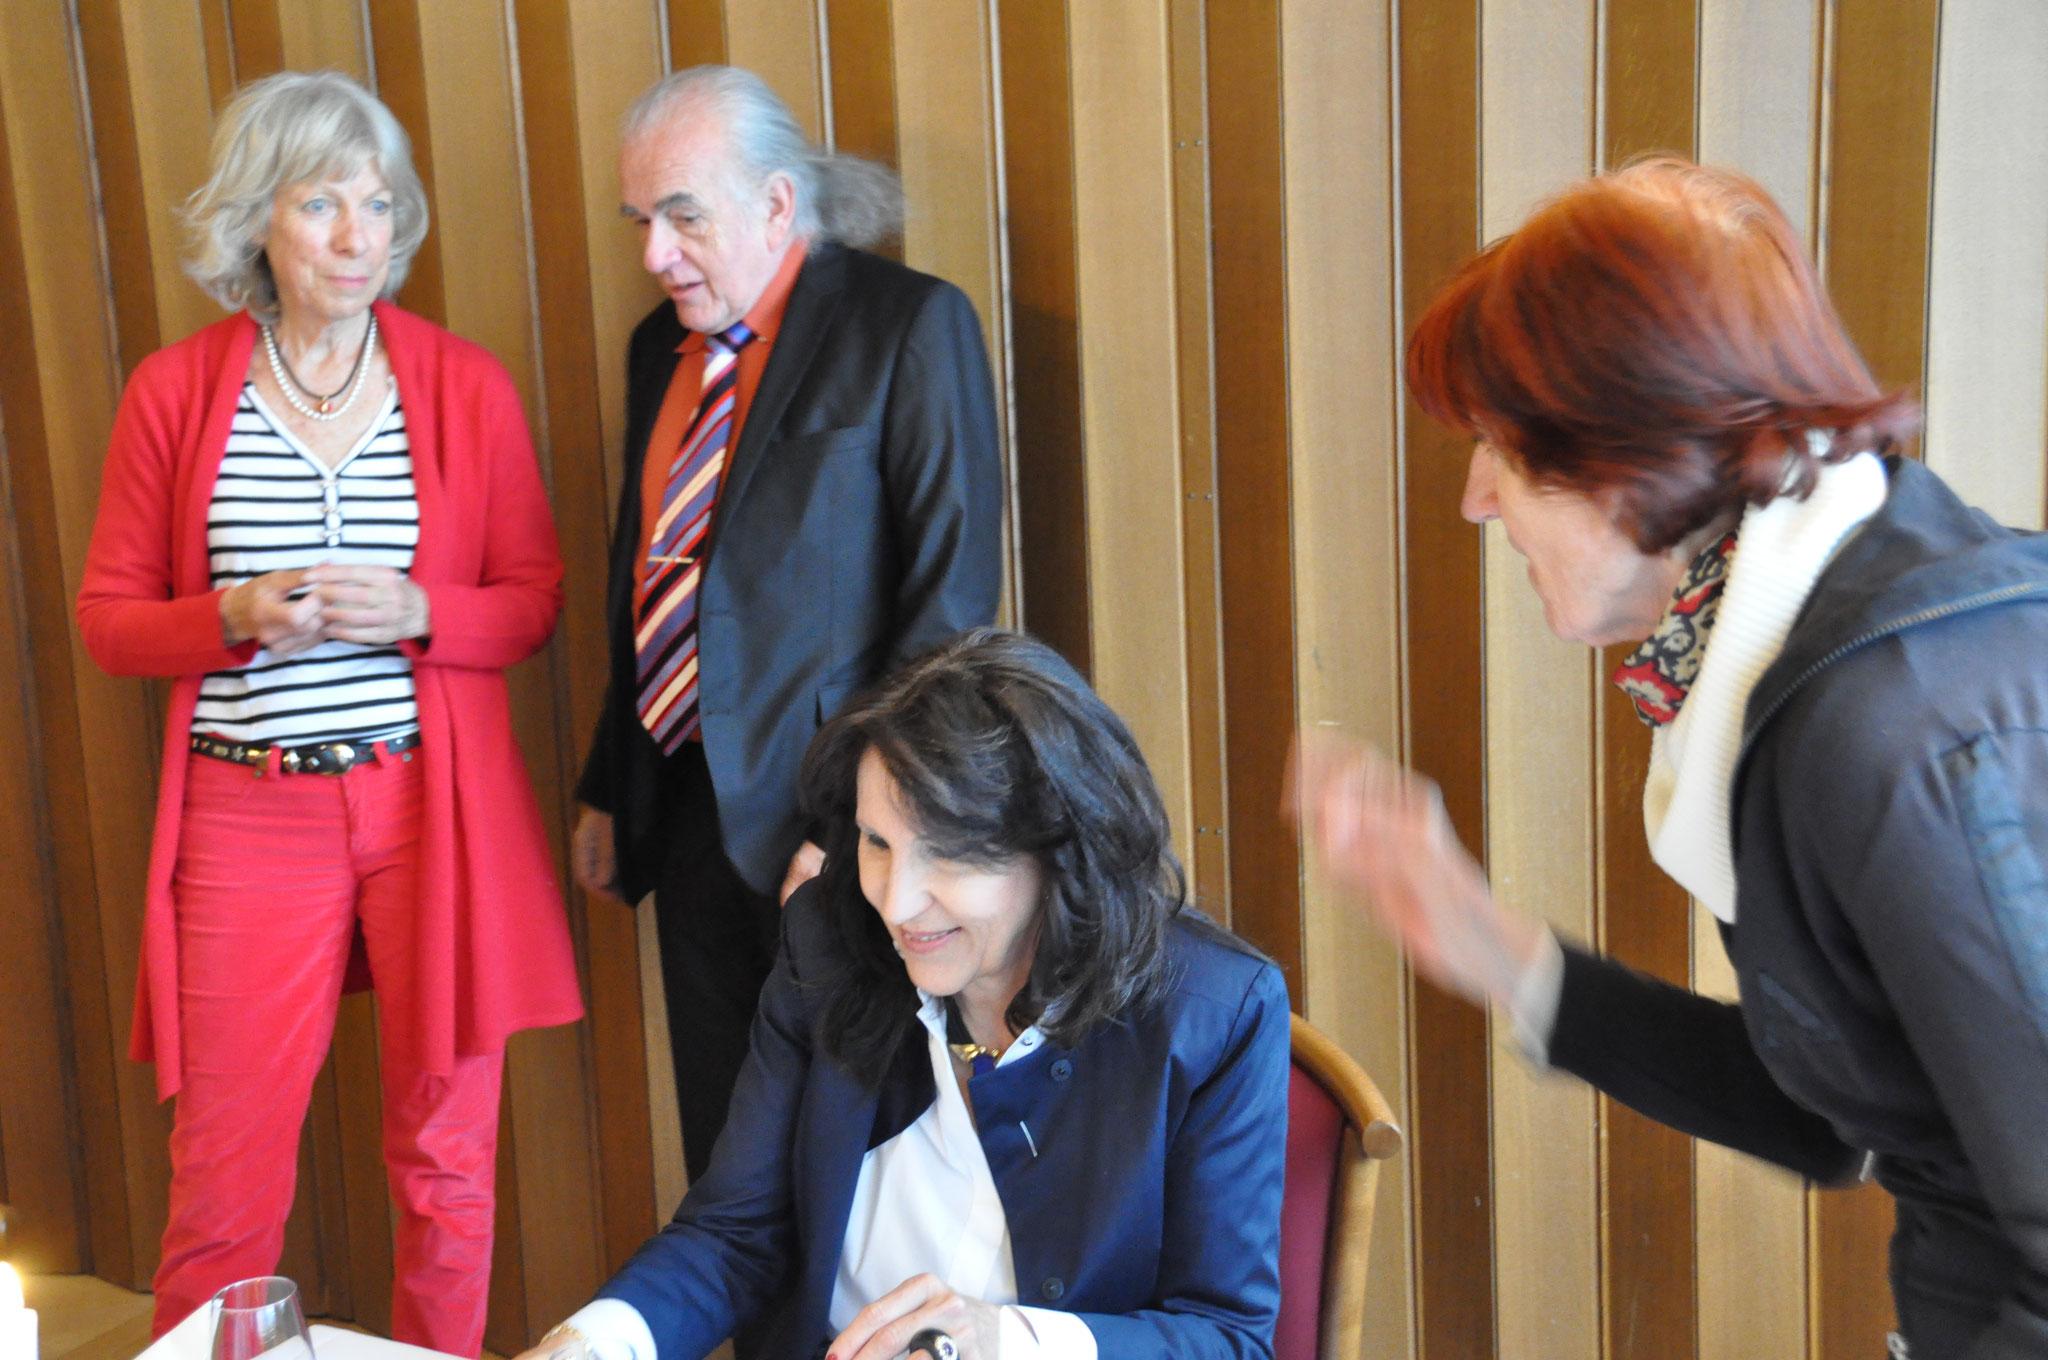 Jacqueline Hodler, Kurt Scheurer, Beatrice Ganz, Rosemarie Schneider